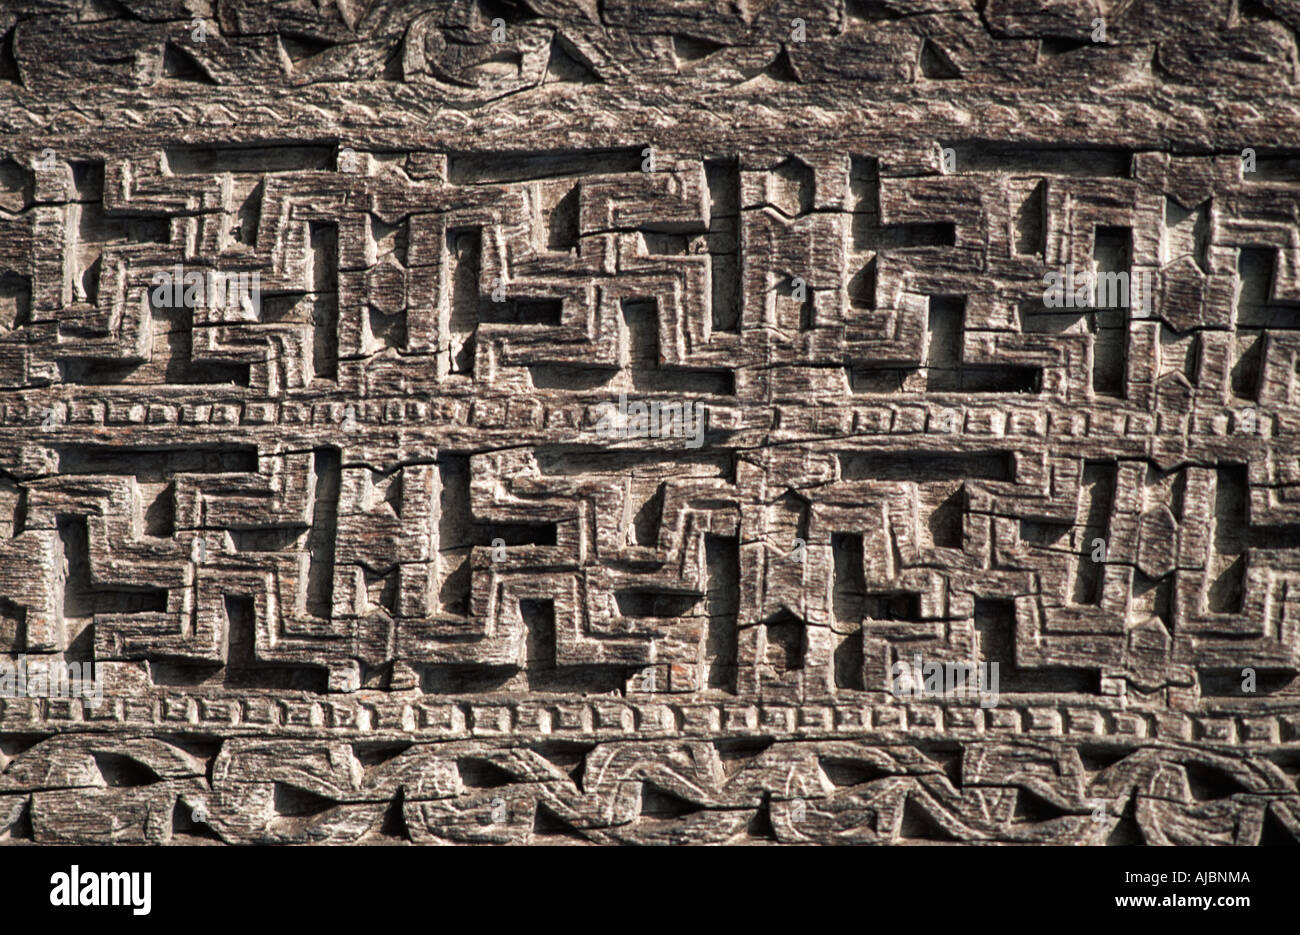 Altit Fort Karimabad Hunza Valley Karakoram Highway en route to China Carved lintel above doorway PAKISTAN - Stock Image